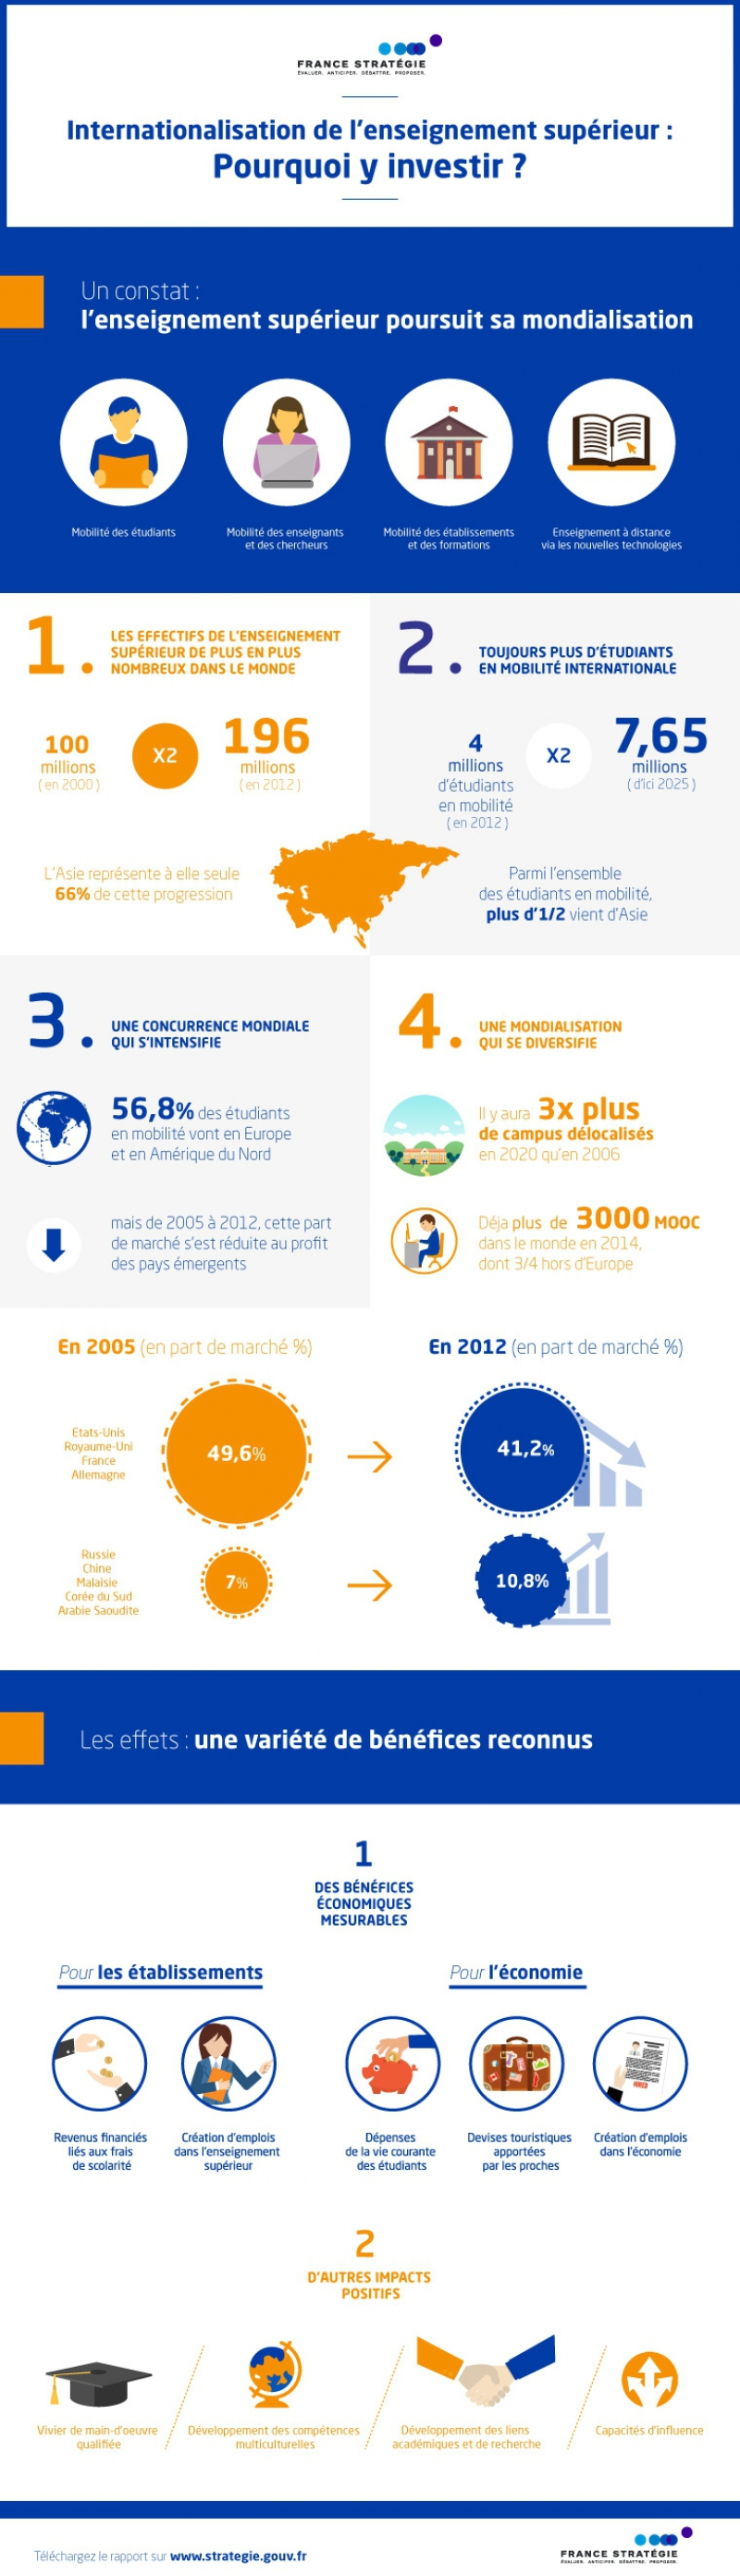 infographie_internationalisation1_vf.jpg